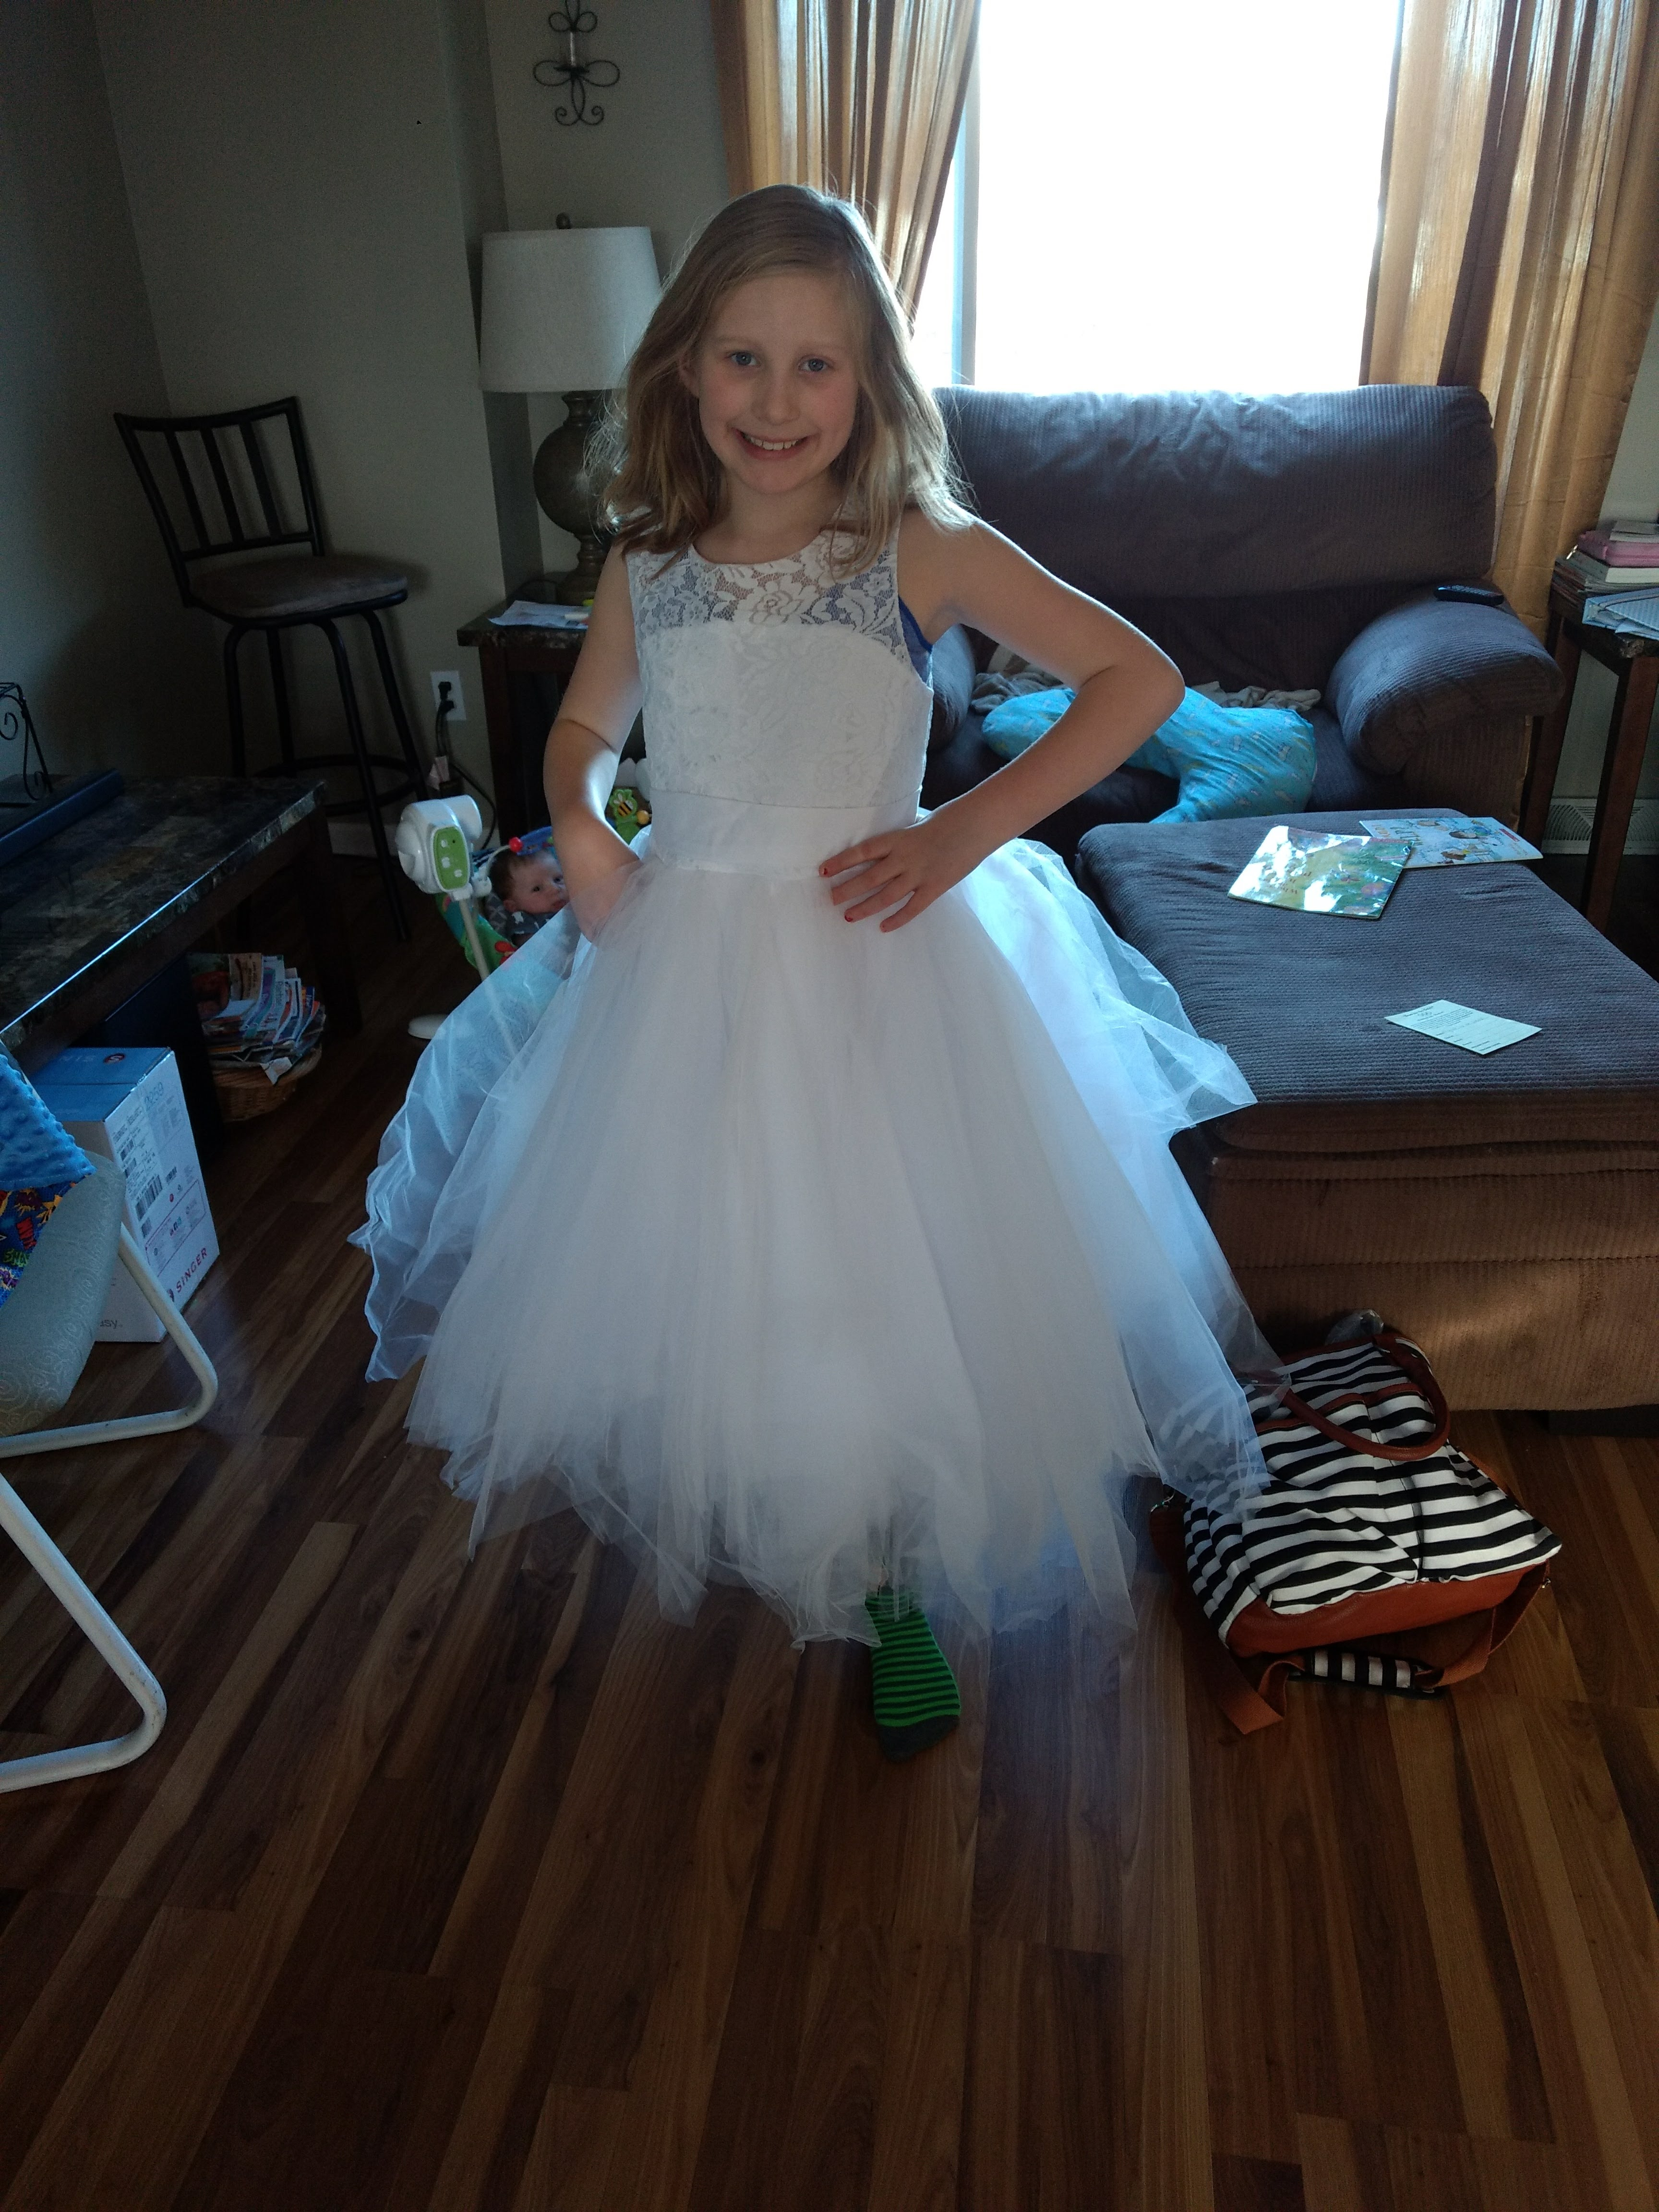 A-Line/Princess Tea-length Flower Girl Dress - Tulle/Lace Sleeveless ...